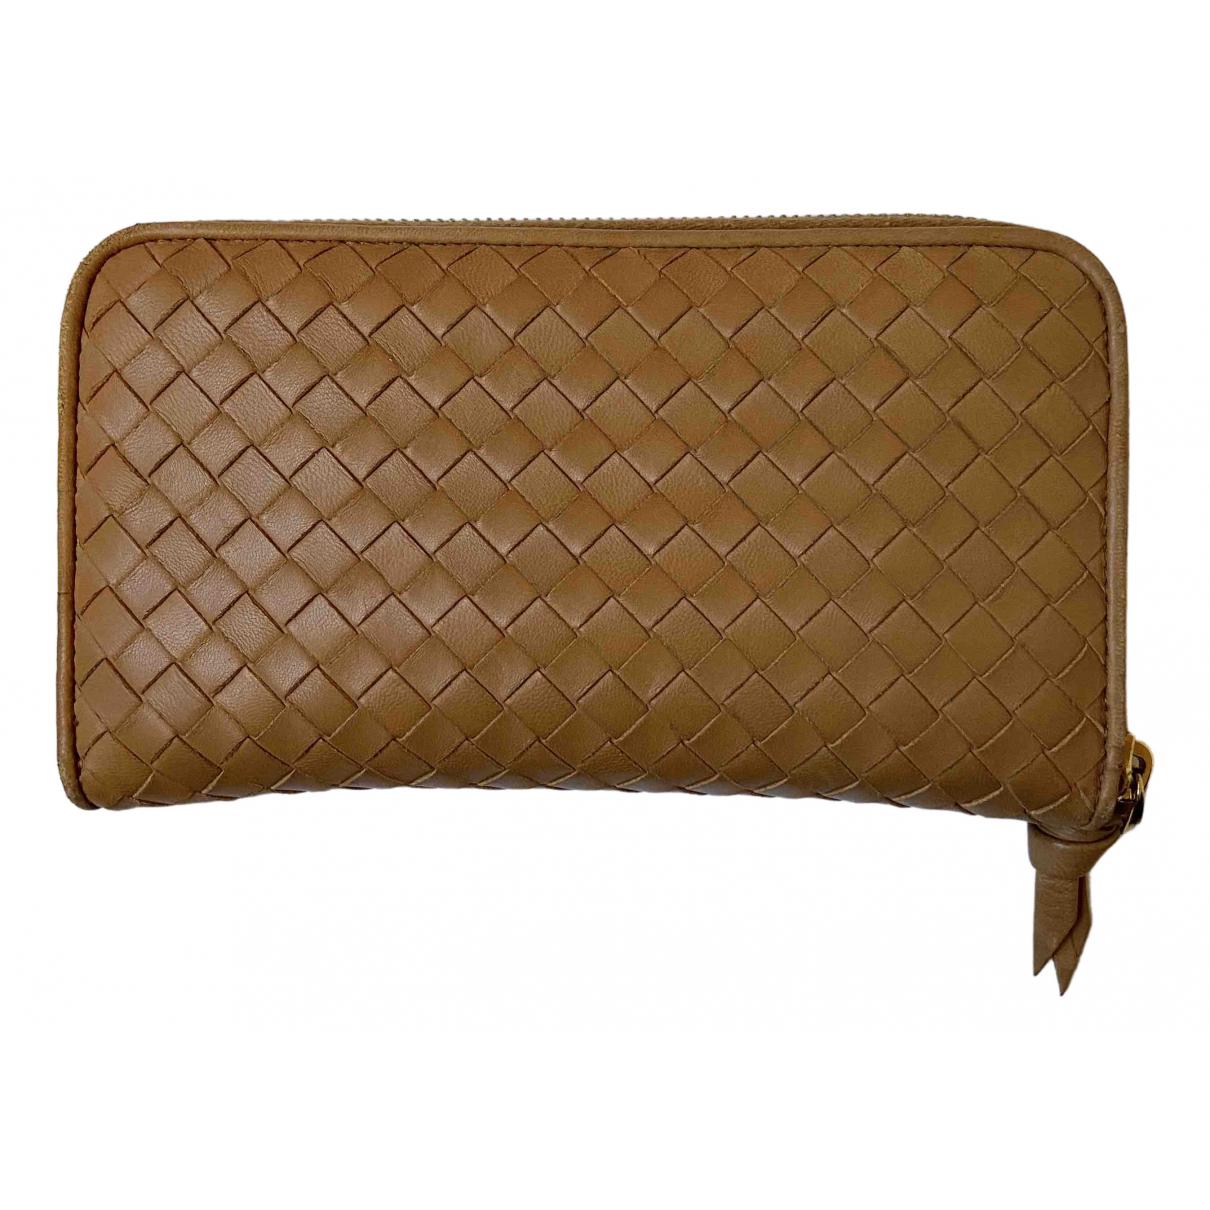 Bottega Veneta Intrecciato Beige Leather wallet for Women N